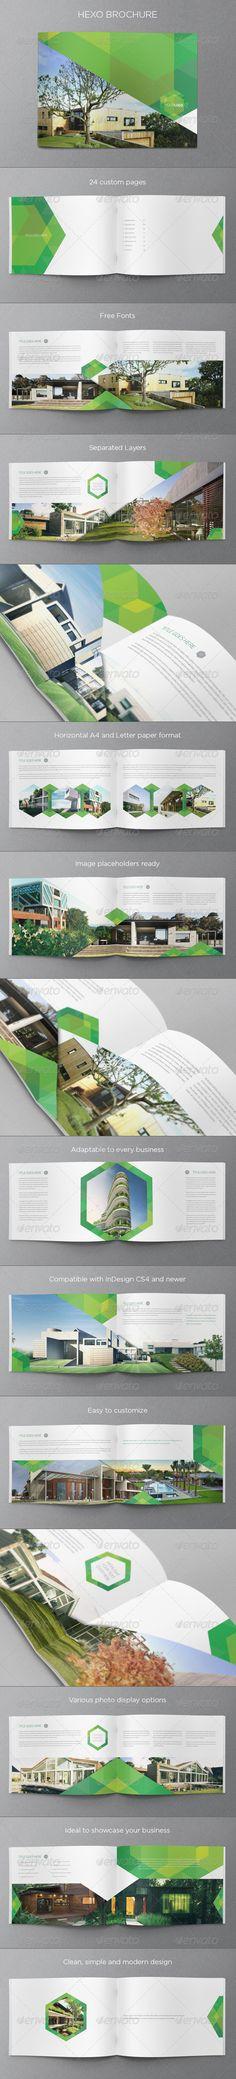 Real Estate Ecologic Brochure - Brochures Print Templates